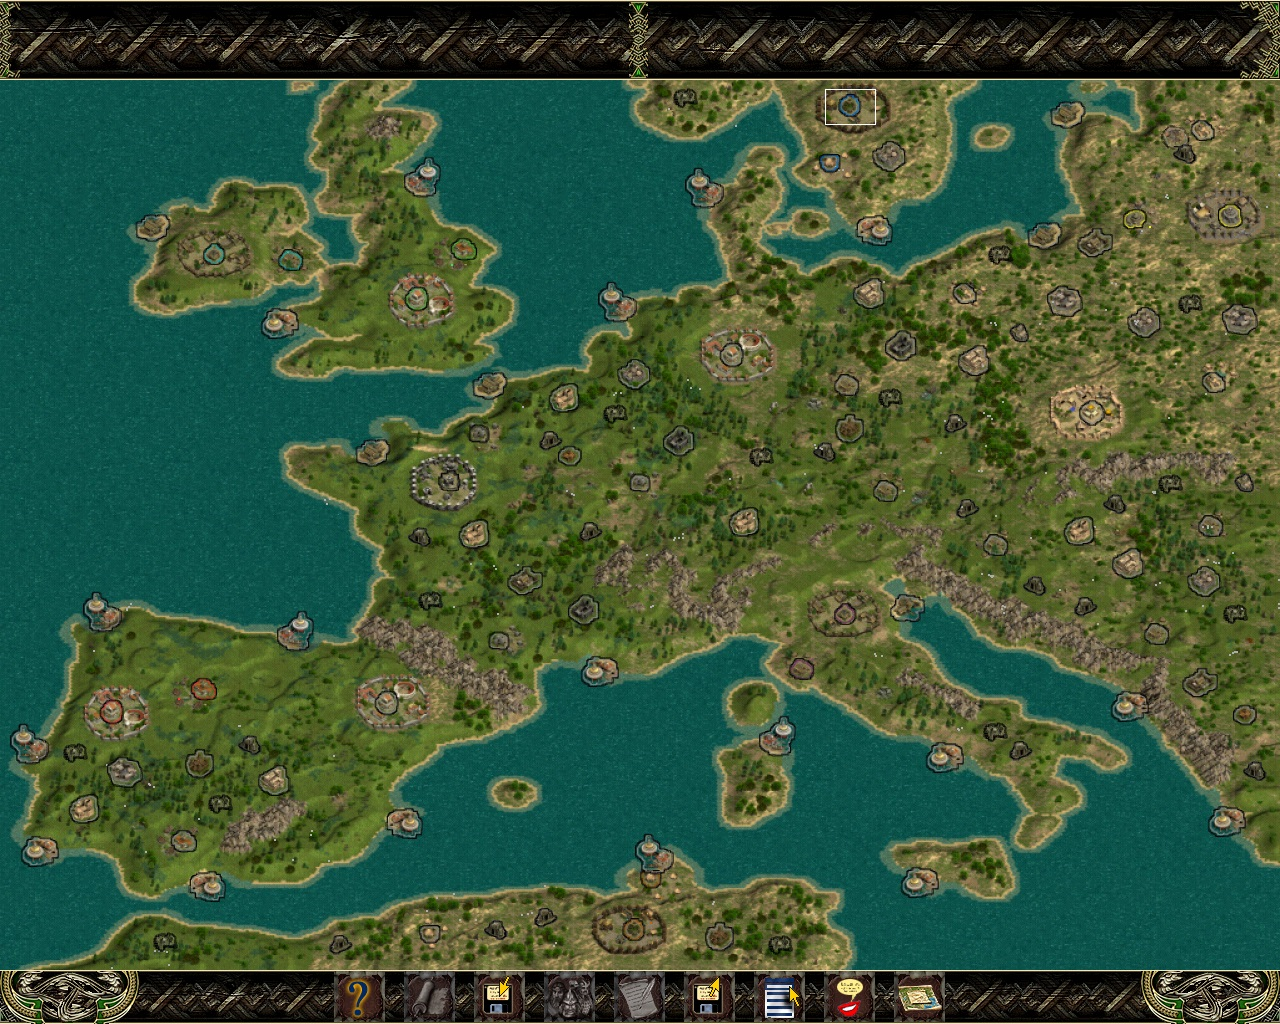 Mapa Sur de Europa image  AsvrMod for Imperium Great Battles of